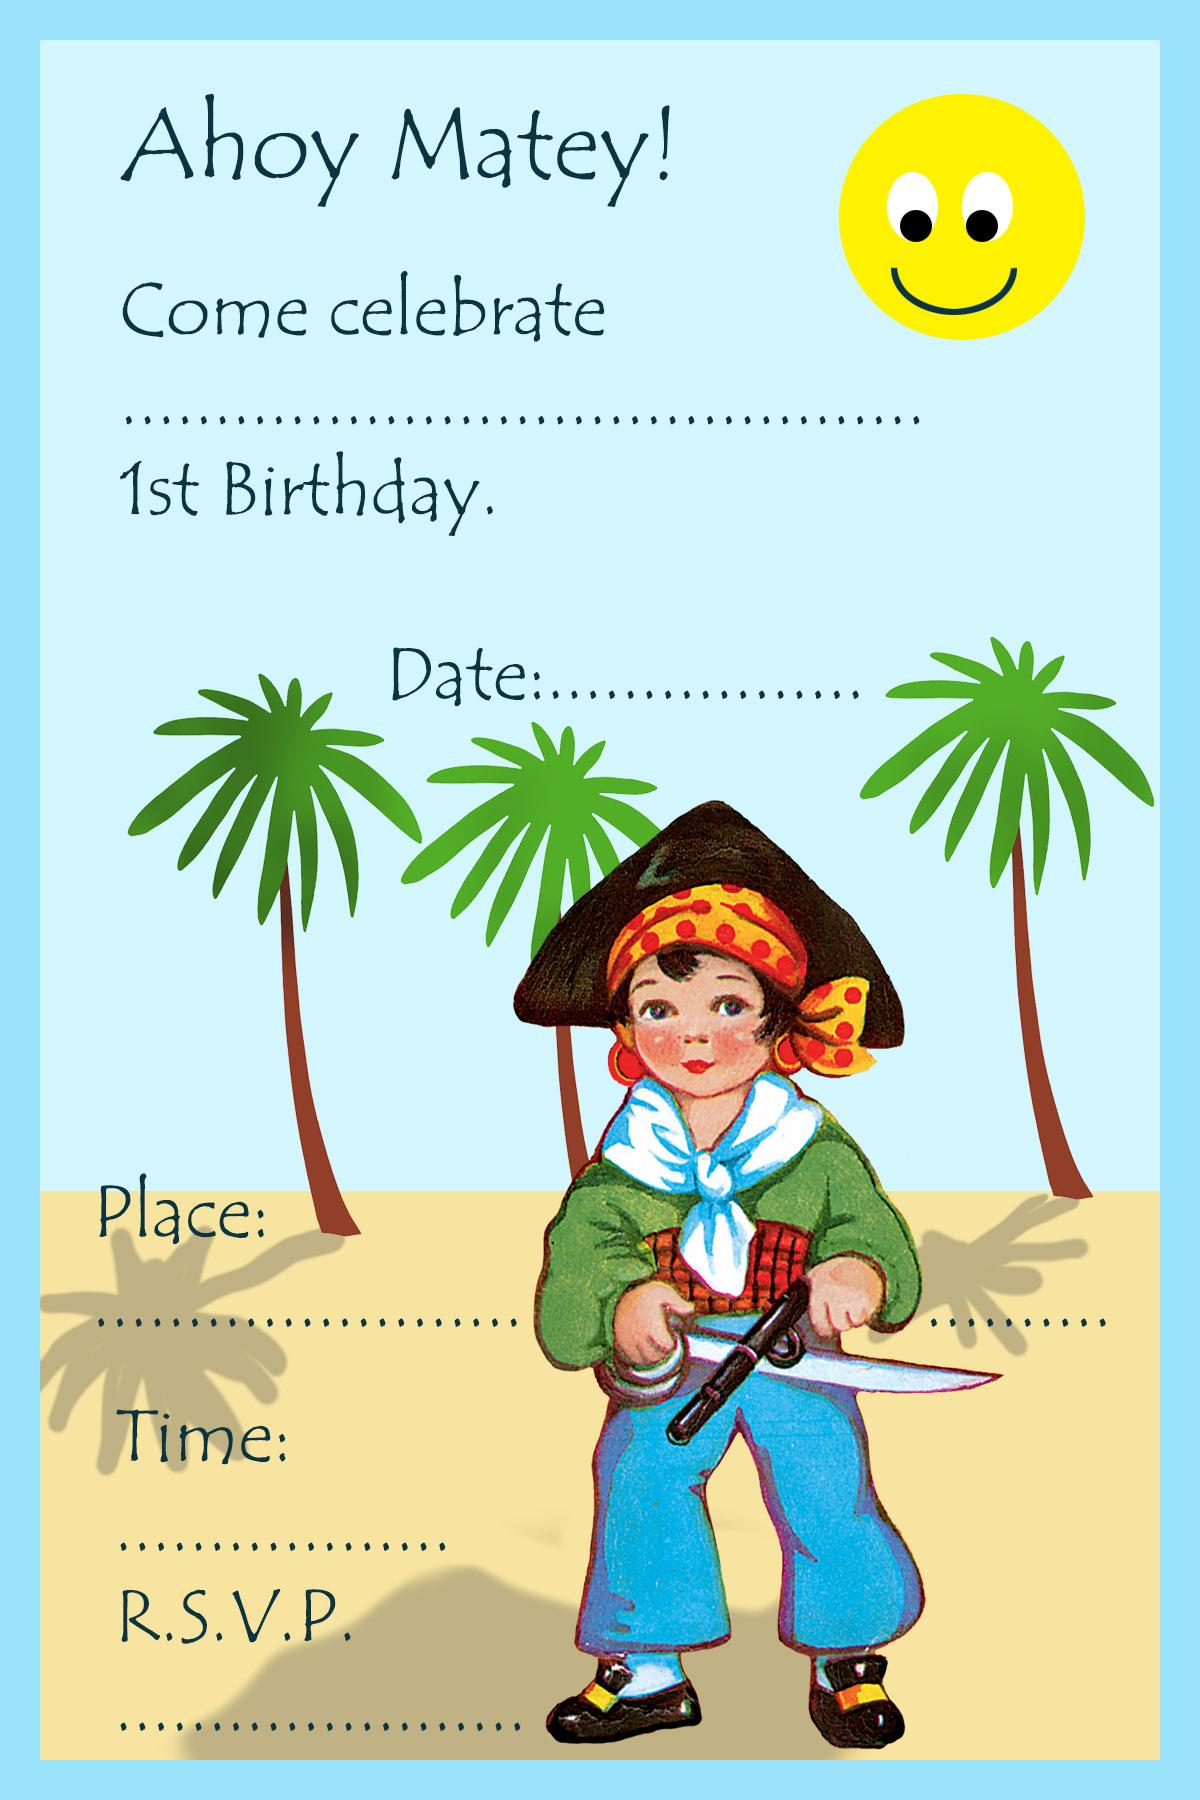 1st birthday invitation with pirate